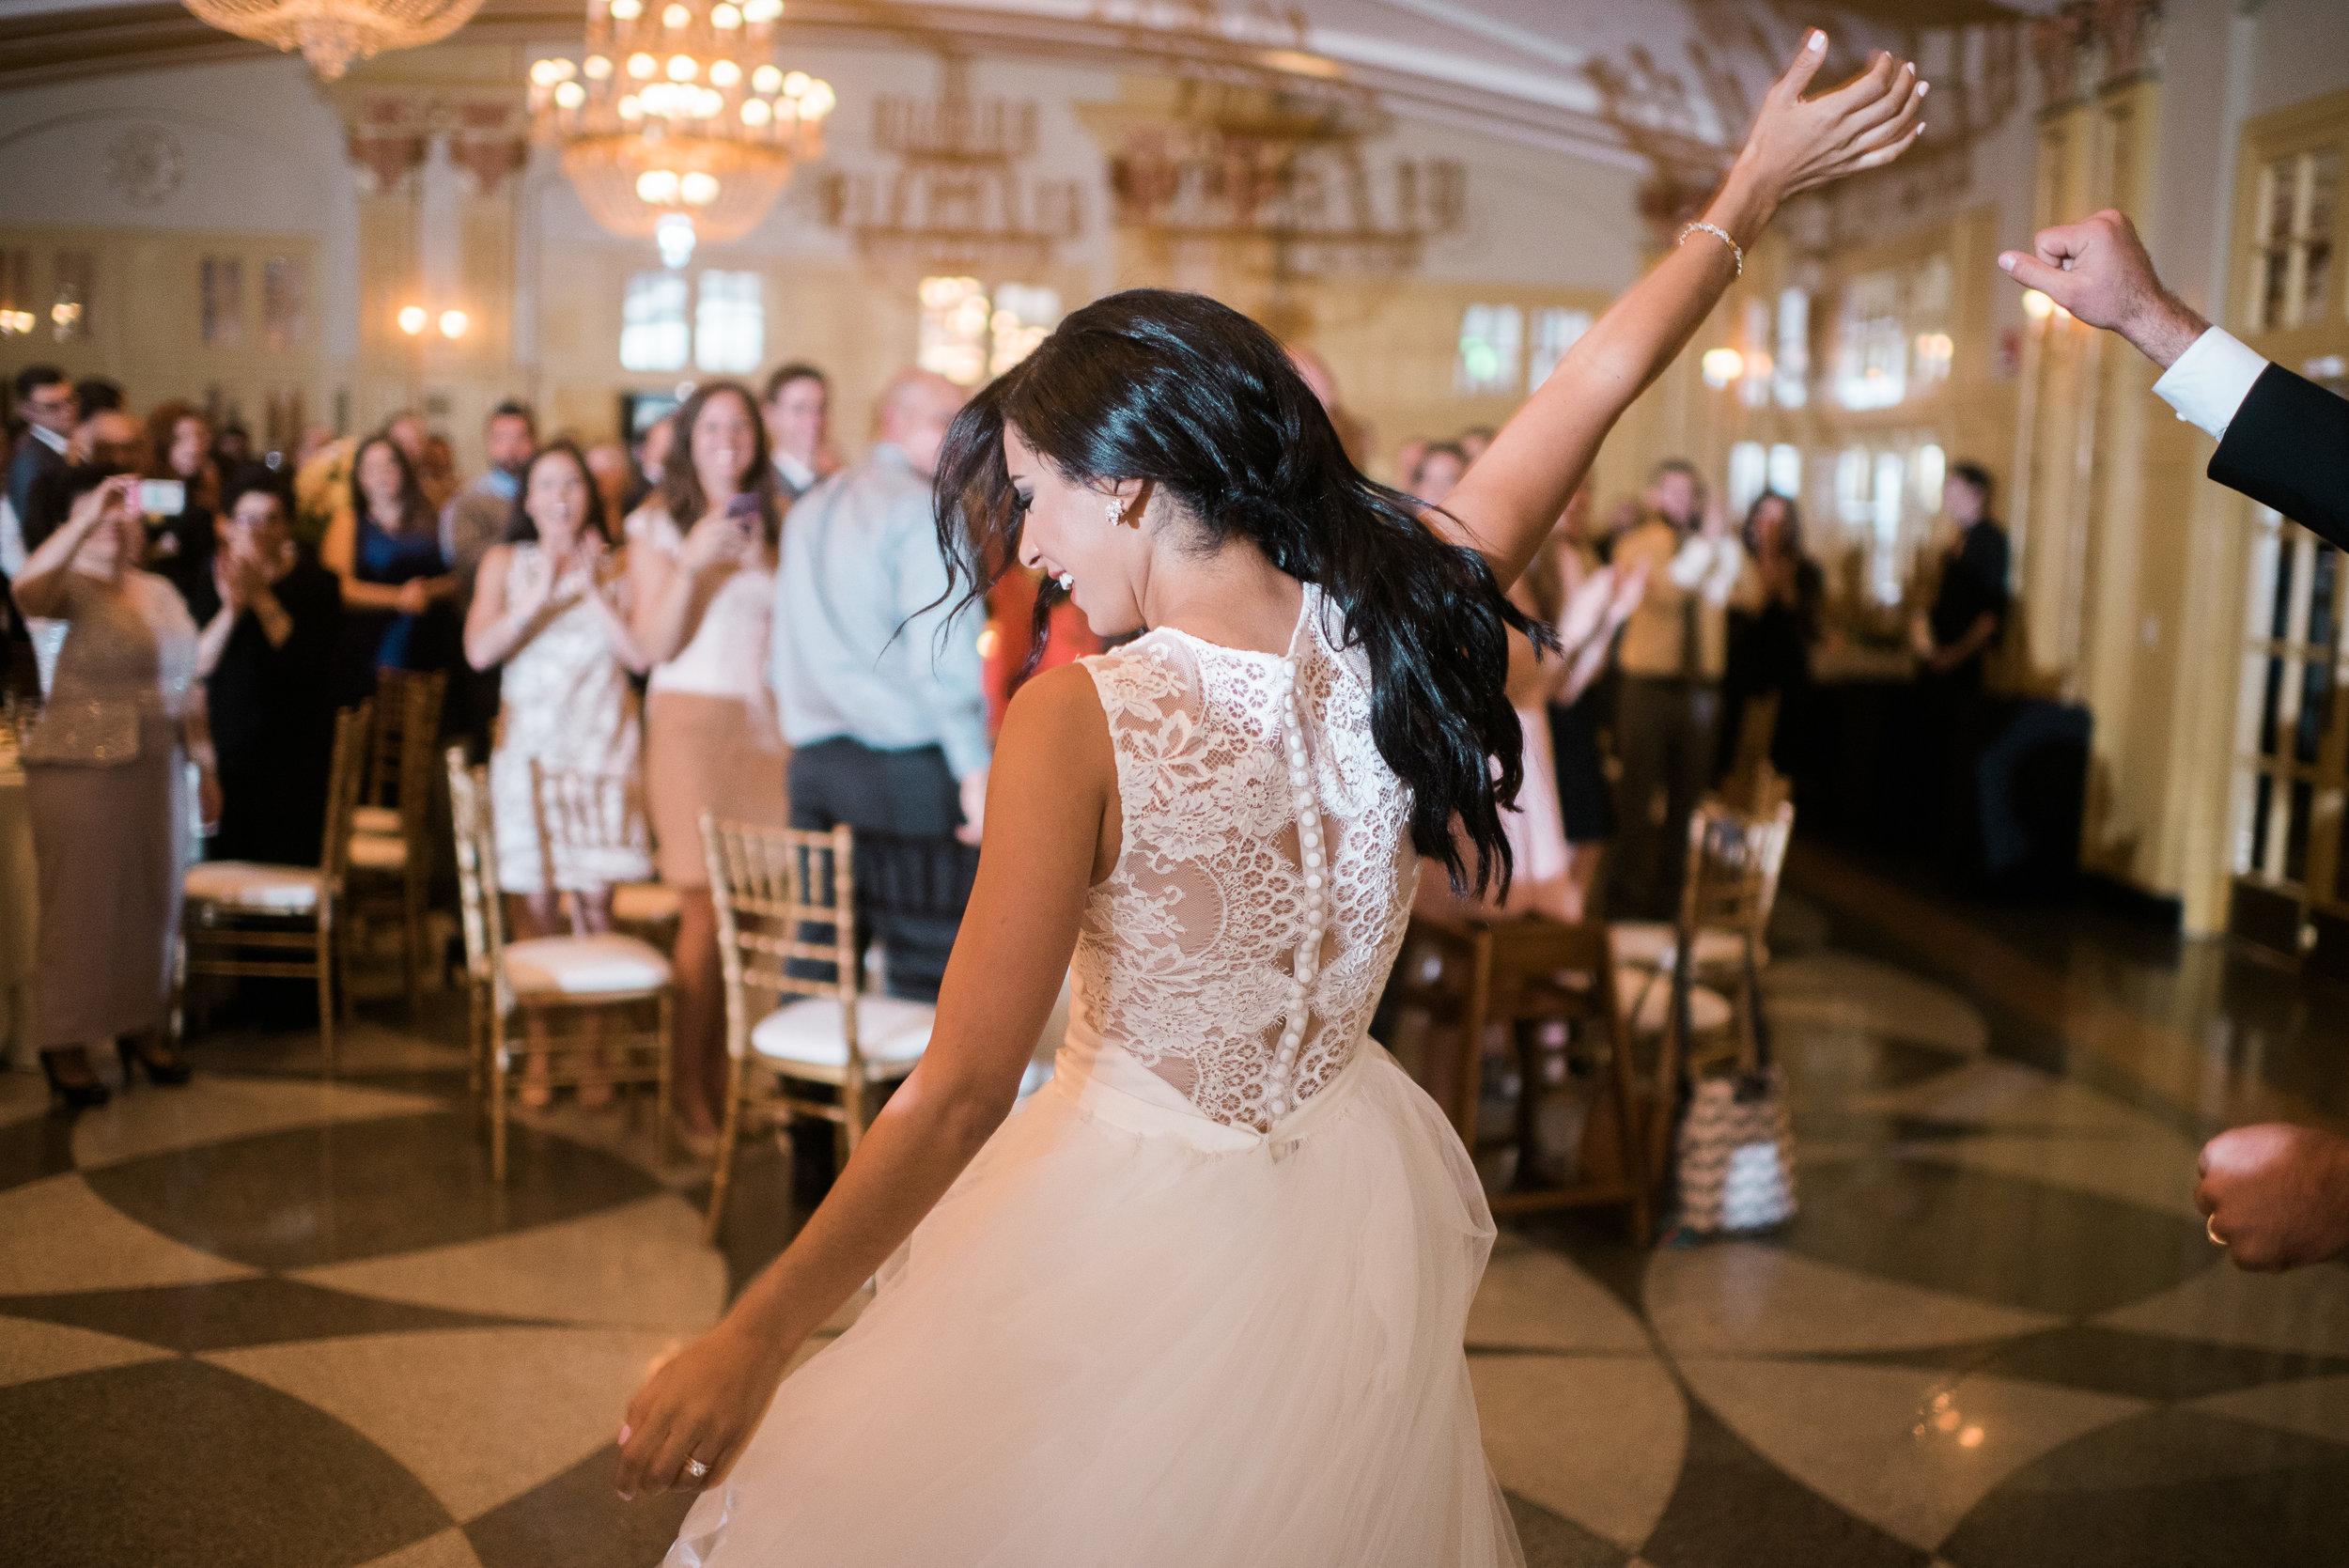 Kansas City Portrait, Engagement and Wedding Photographer